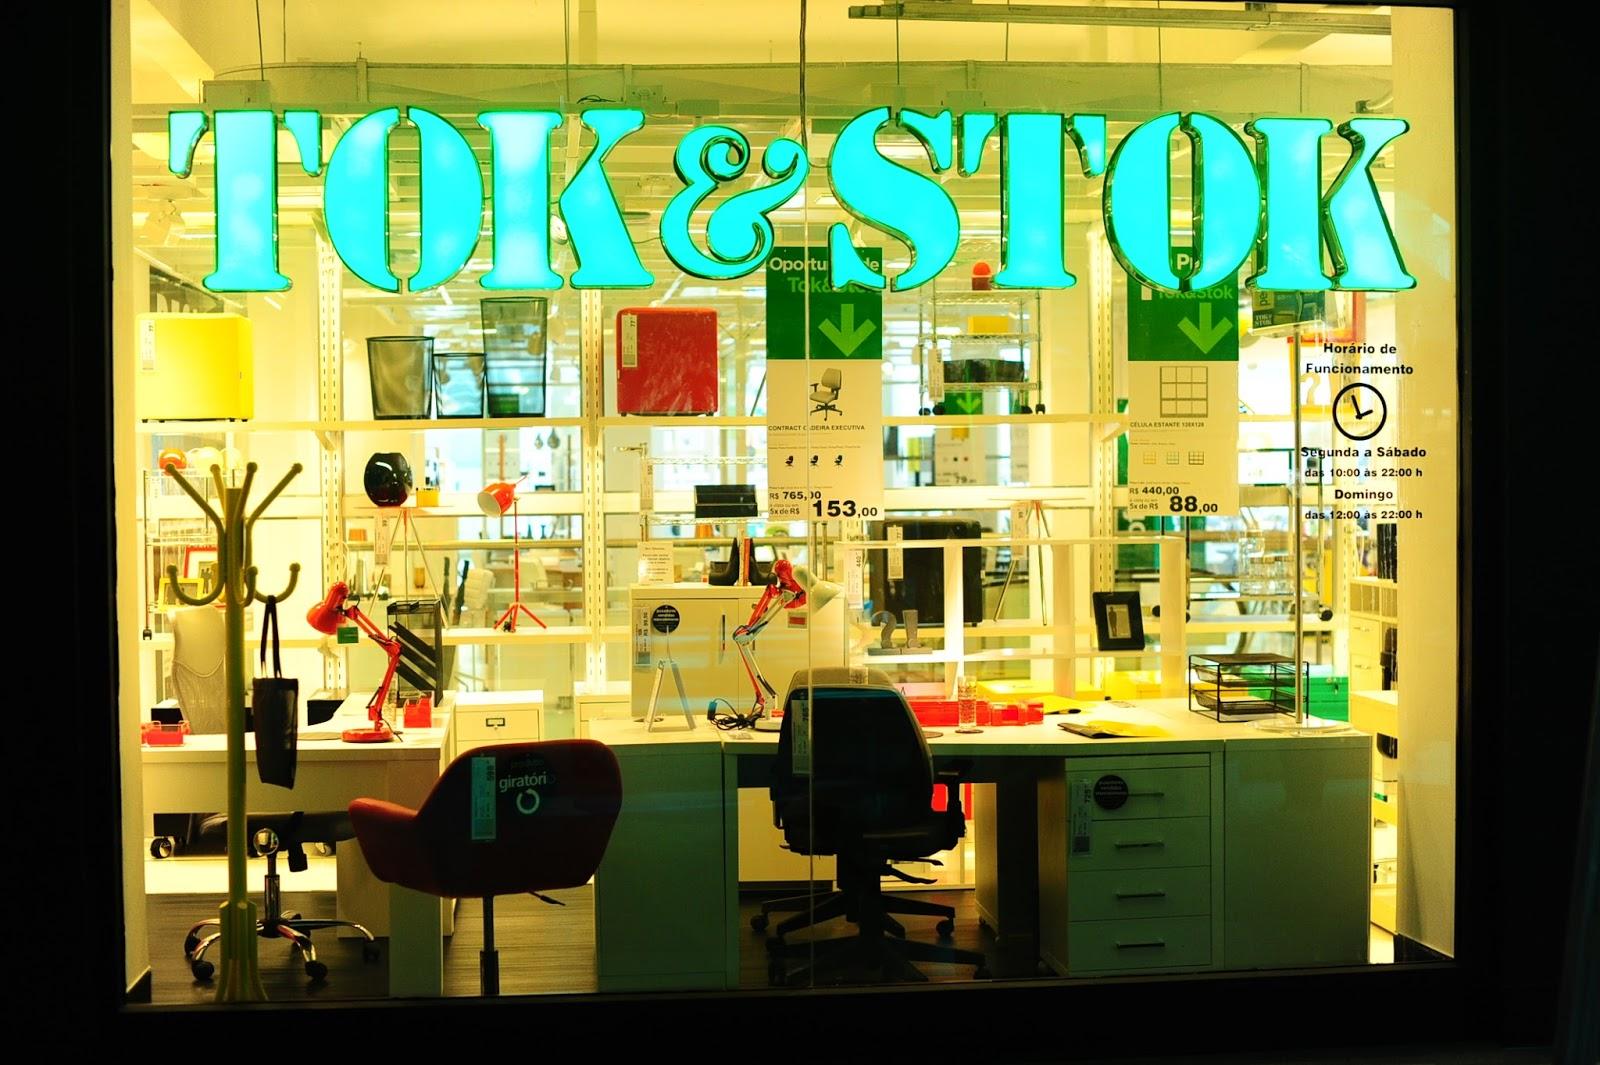 Tok&Stok inaugura sua primeira loja na Paraíba #03C8C2 1600x1065 Acessorios Banheiro Tok Stok